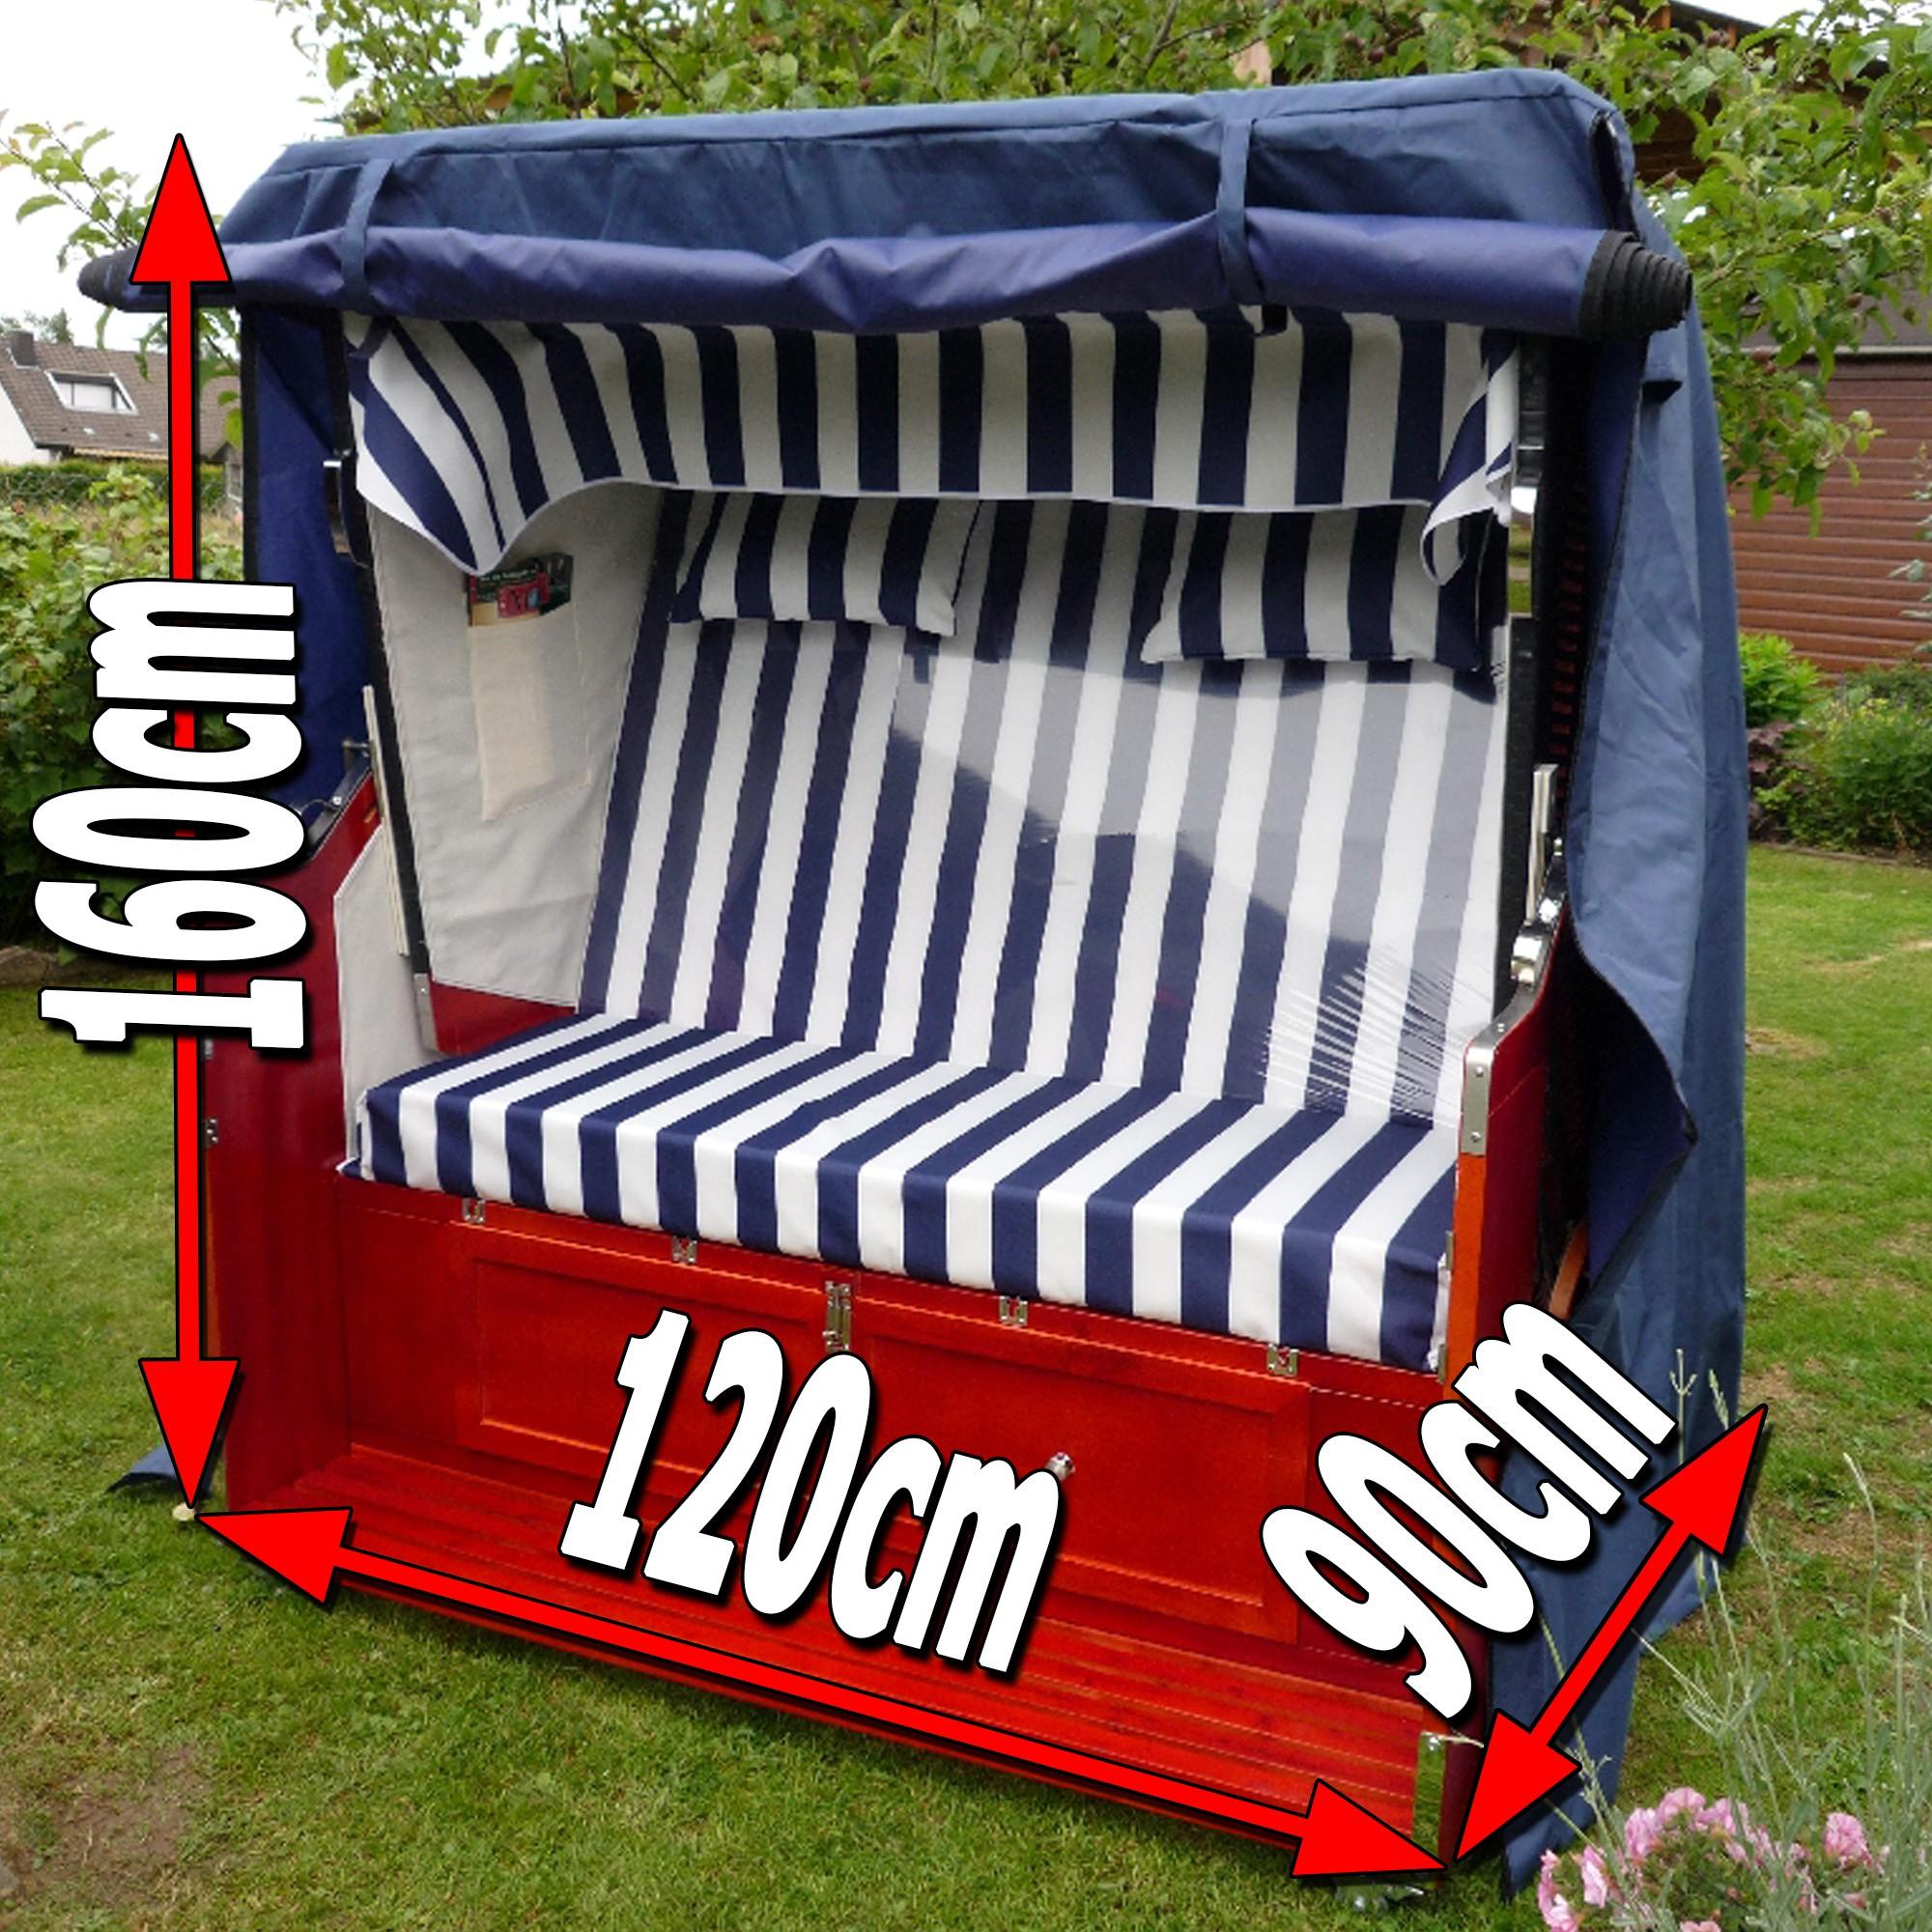 schutzh lle strandkorb winterfest g nstig abdeckhaube f r. Black Bedroom Furniture Sets. Home Design Ideas